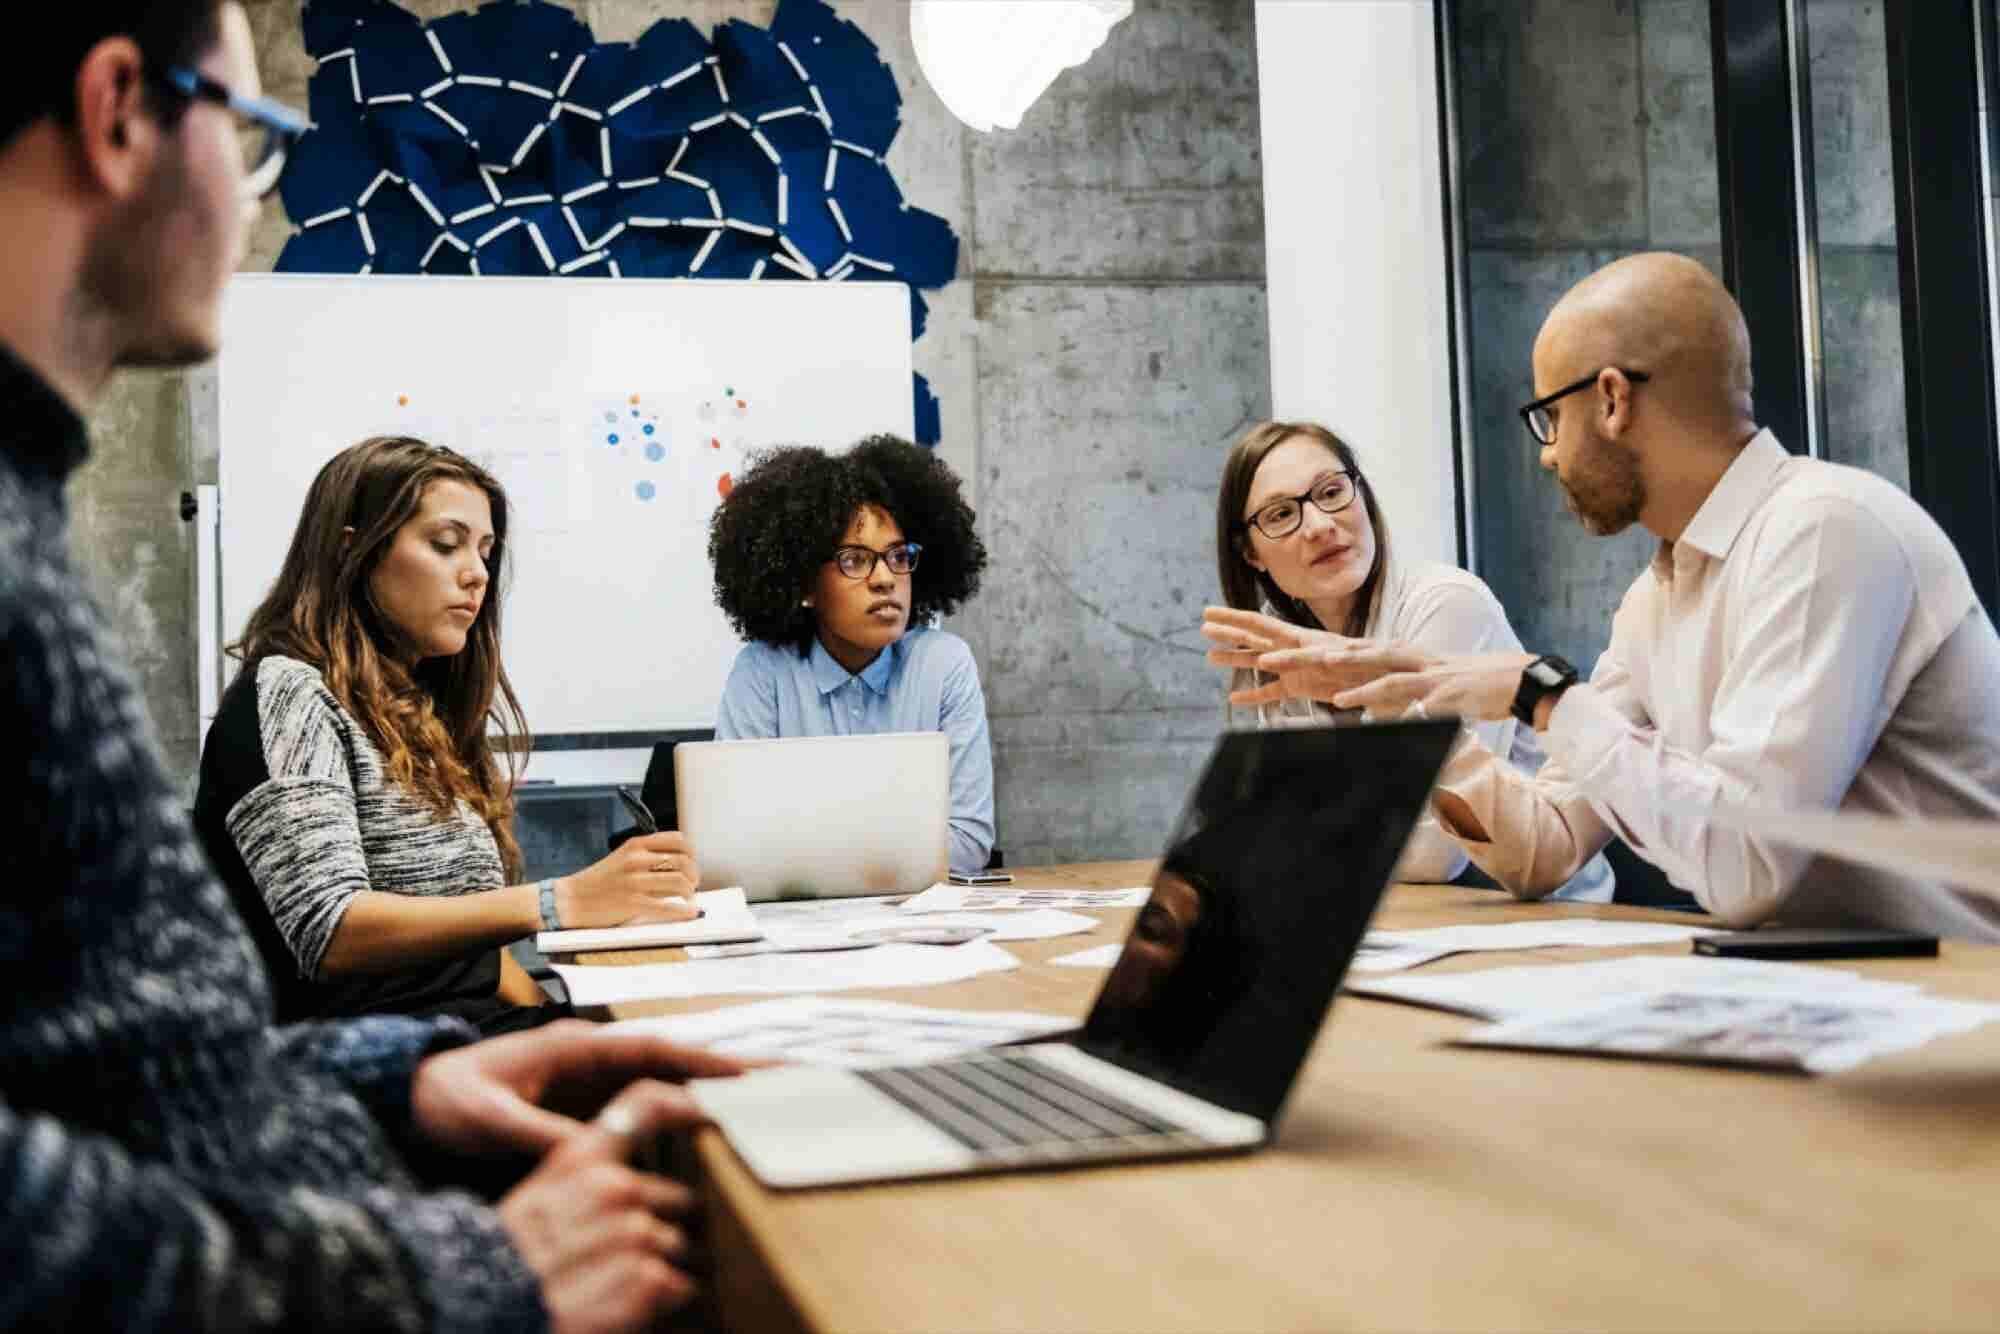 5 Entrepreneurial Shoves to Push You Forward